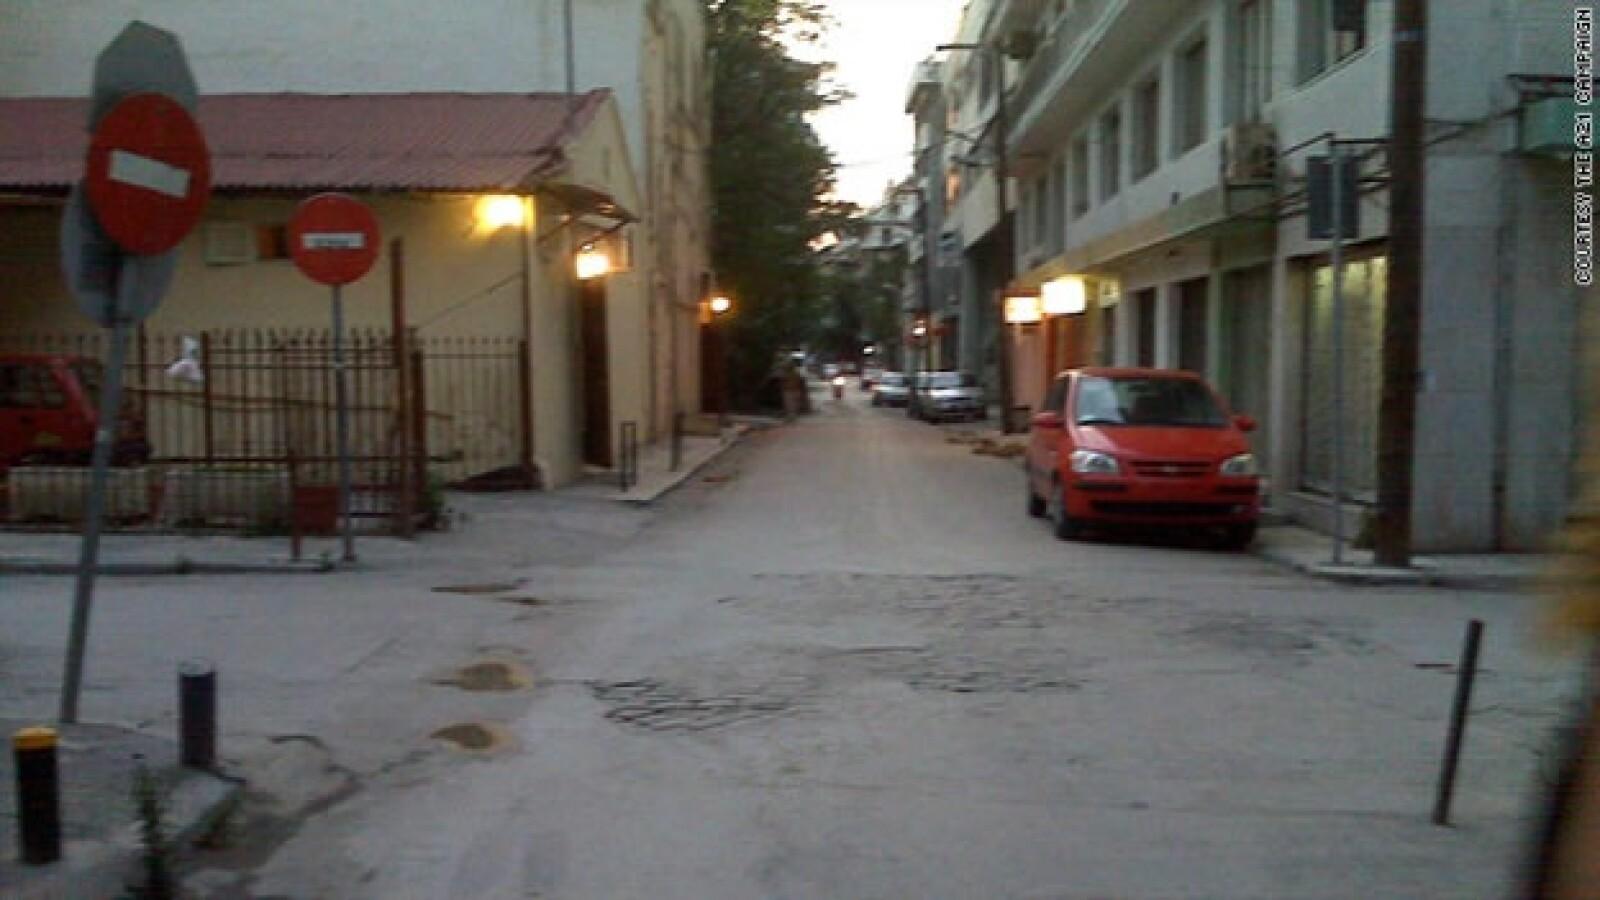 Proyecto libertad - trata de personas - Tesalónica